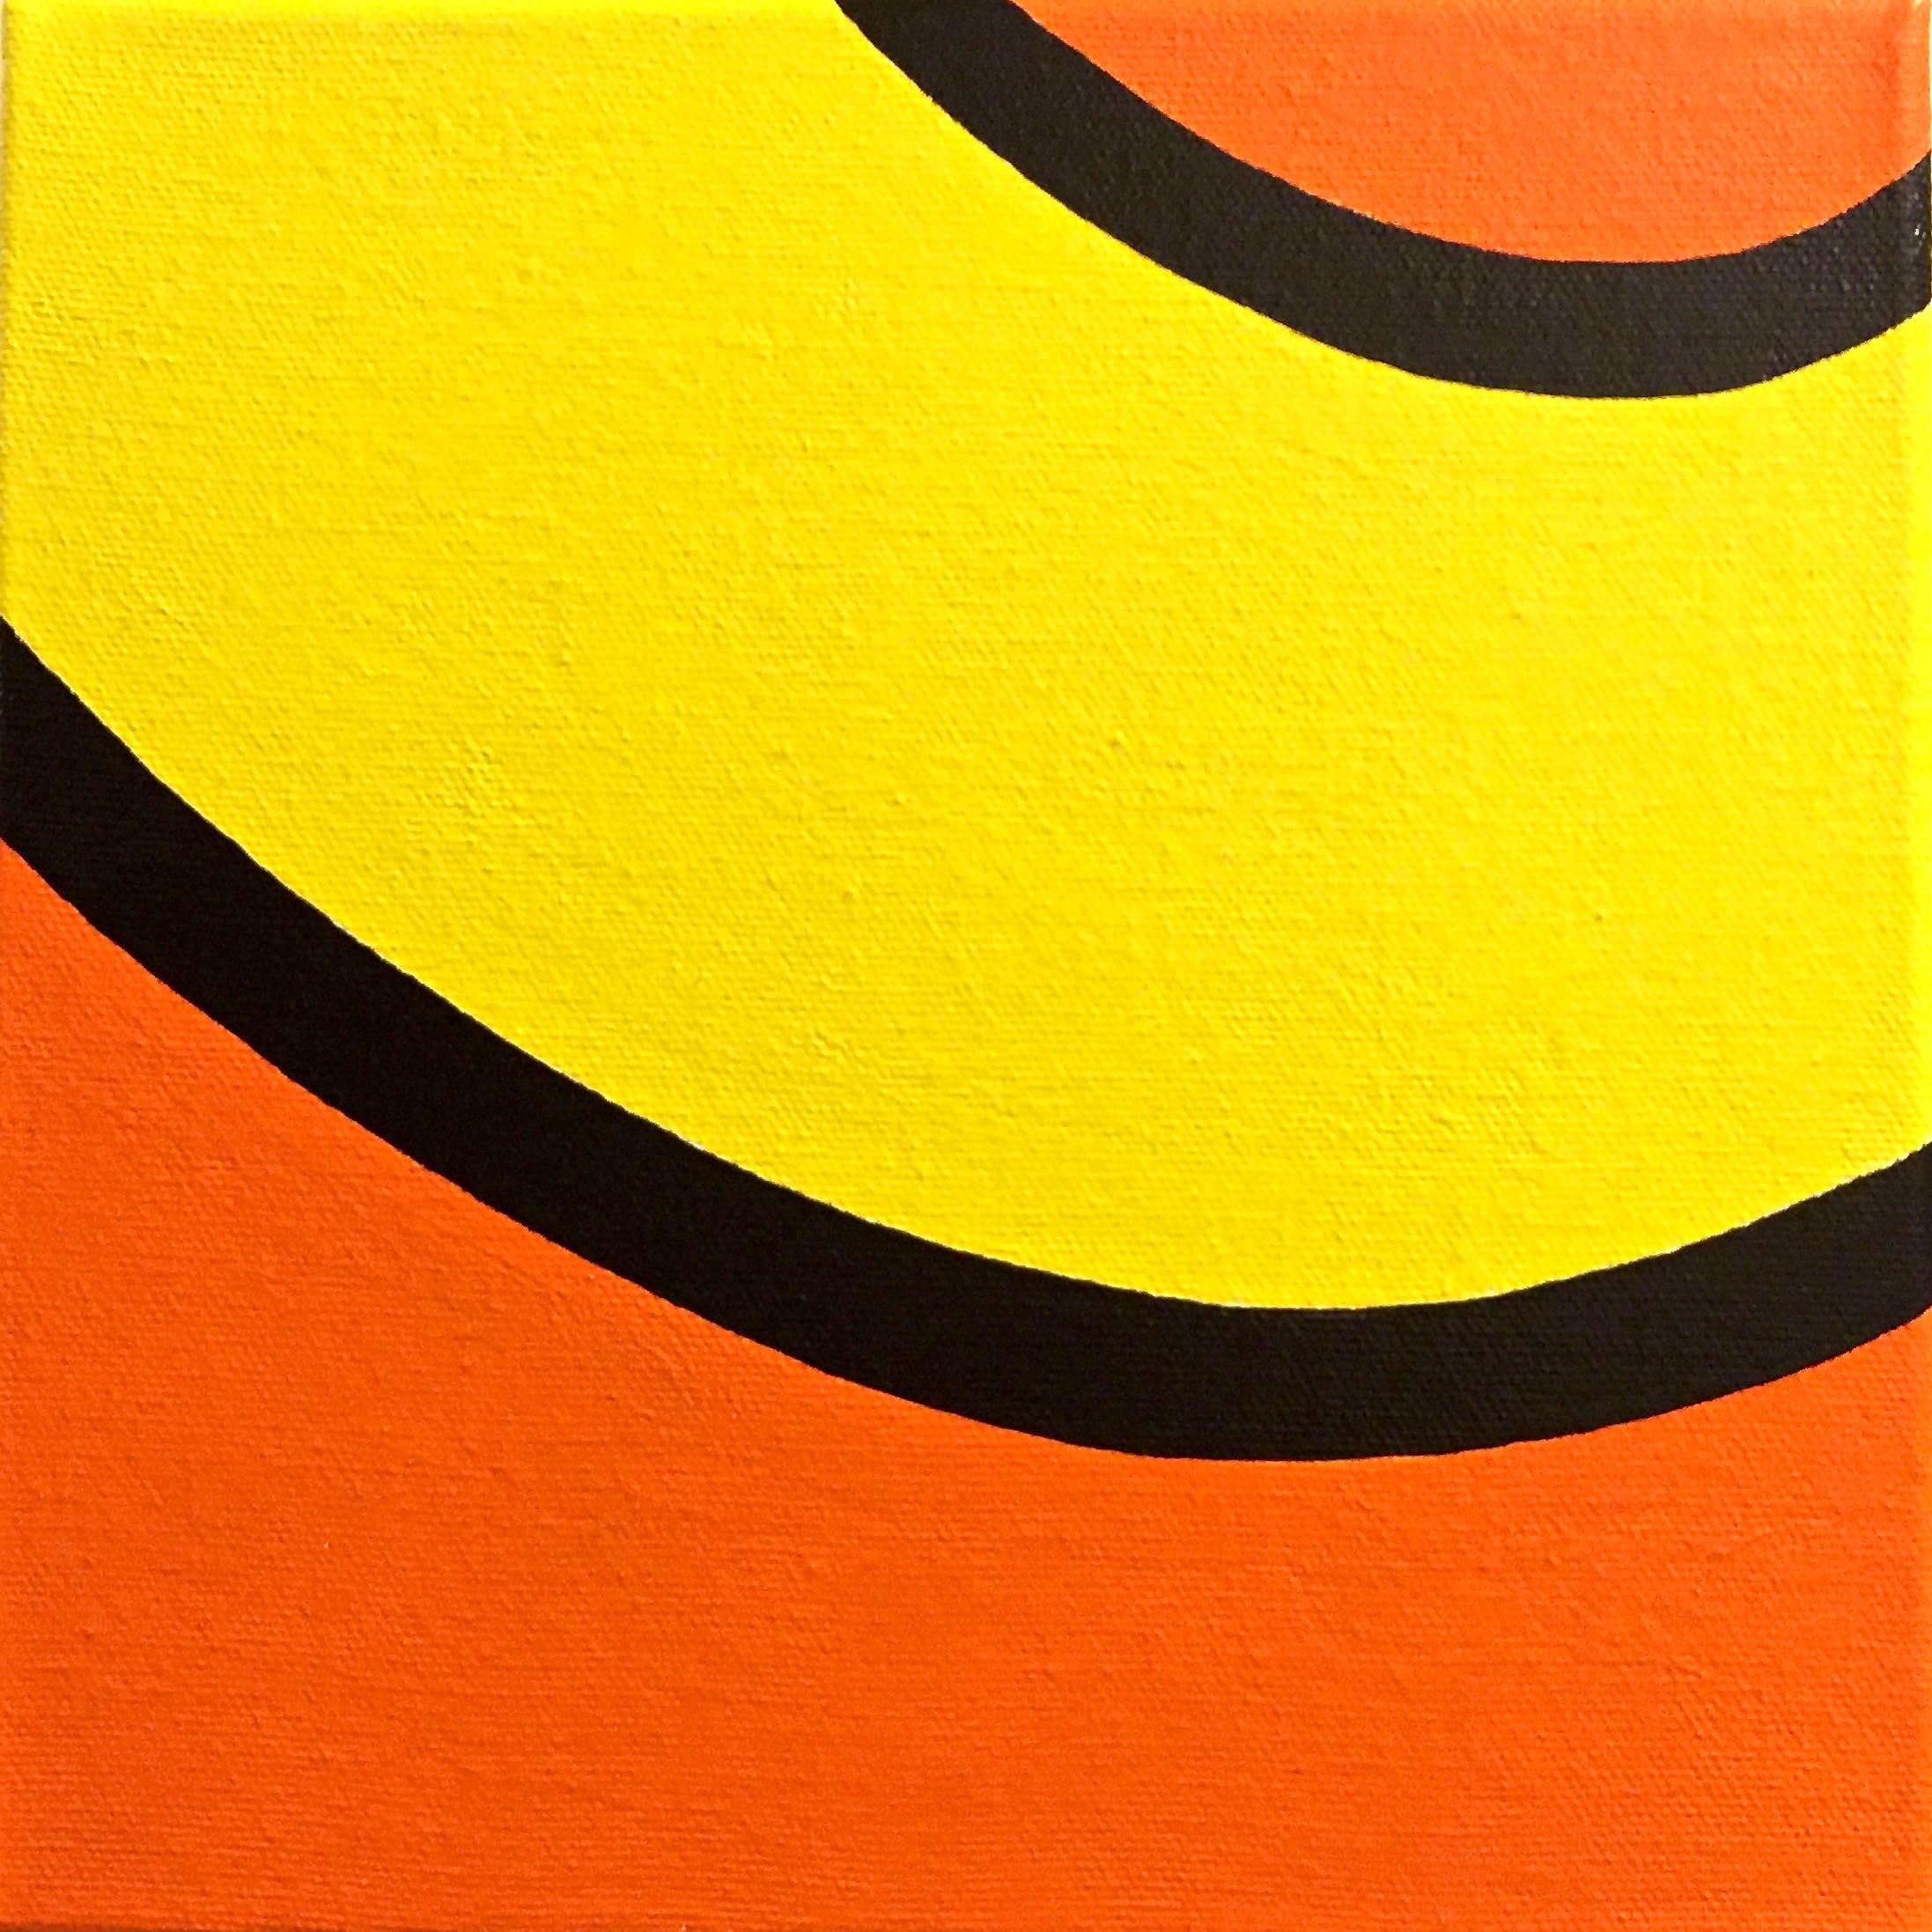 "Top #17 | H. 8"" W. 8"" | Acrylic on canvas | 2016"